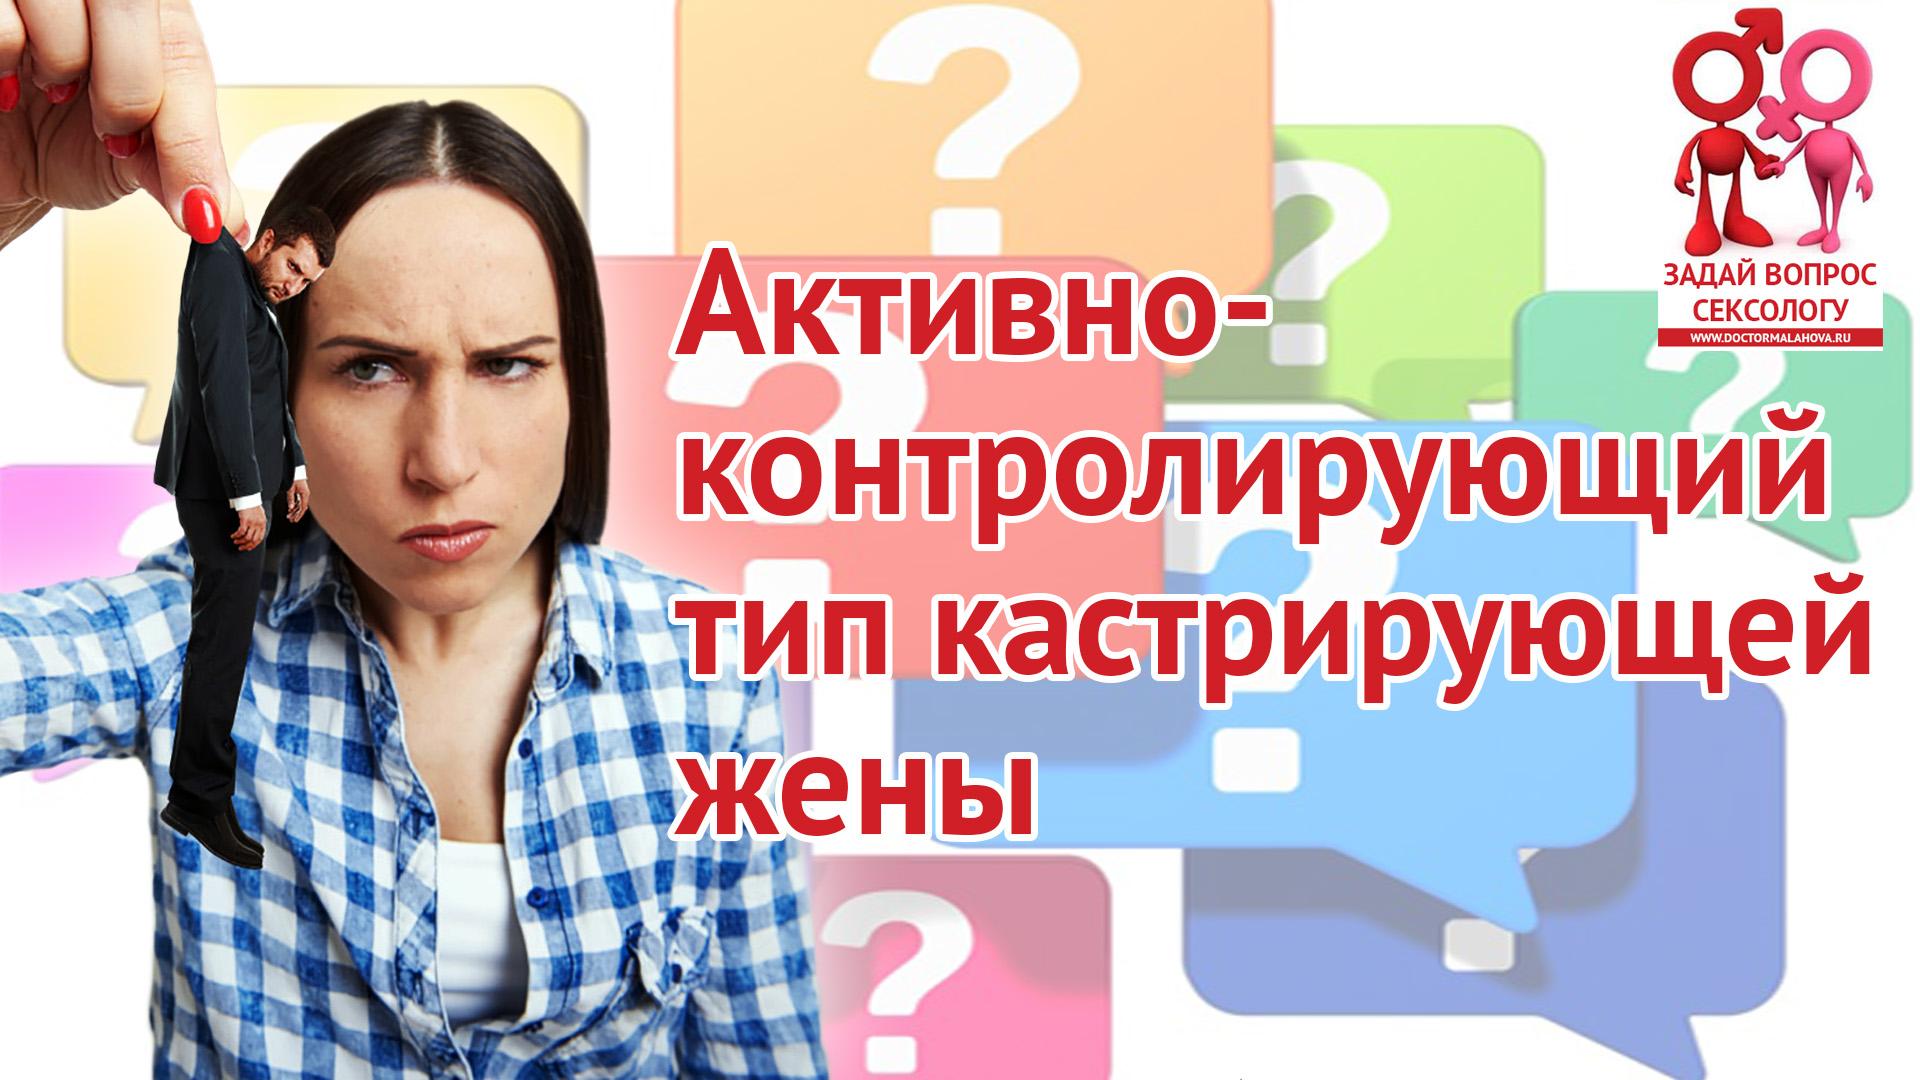 Кастрация_часть7